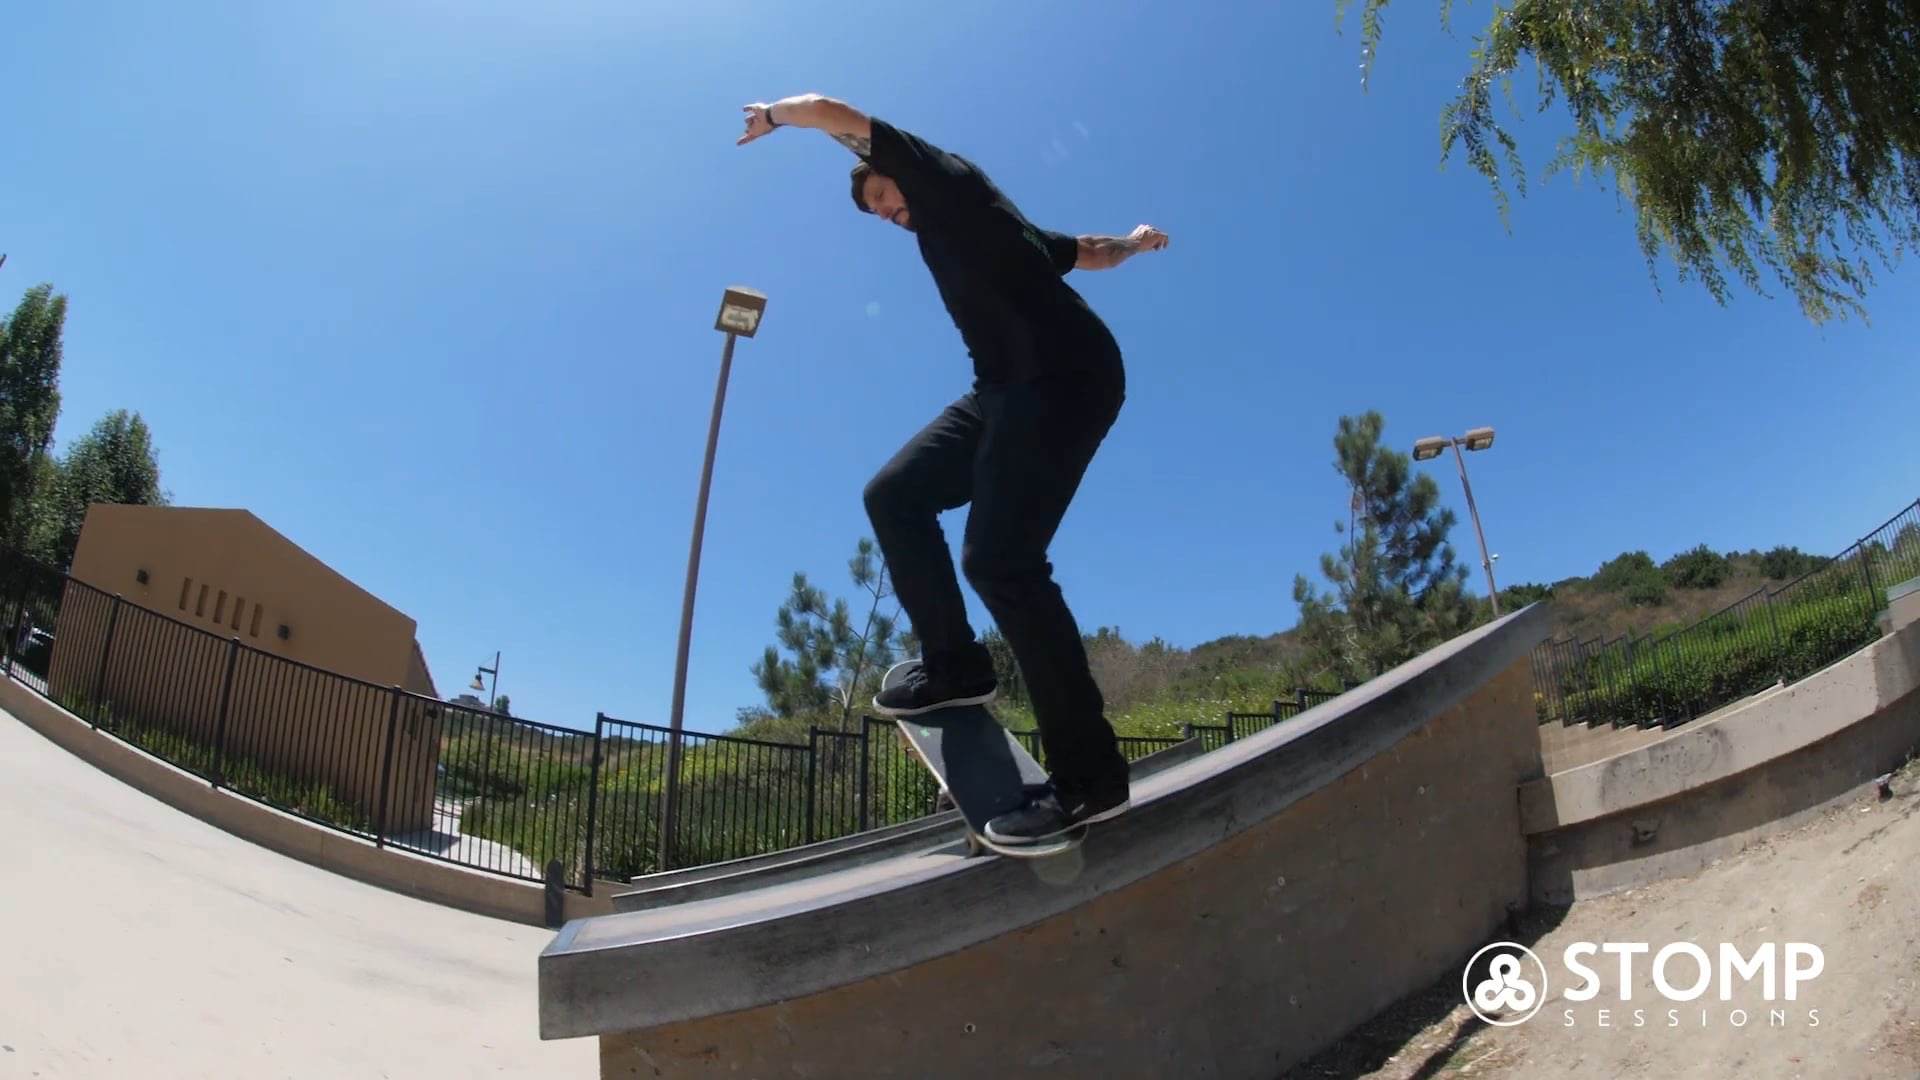 06 Stomp Skateboarding main image Chris Cole copy